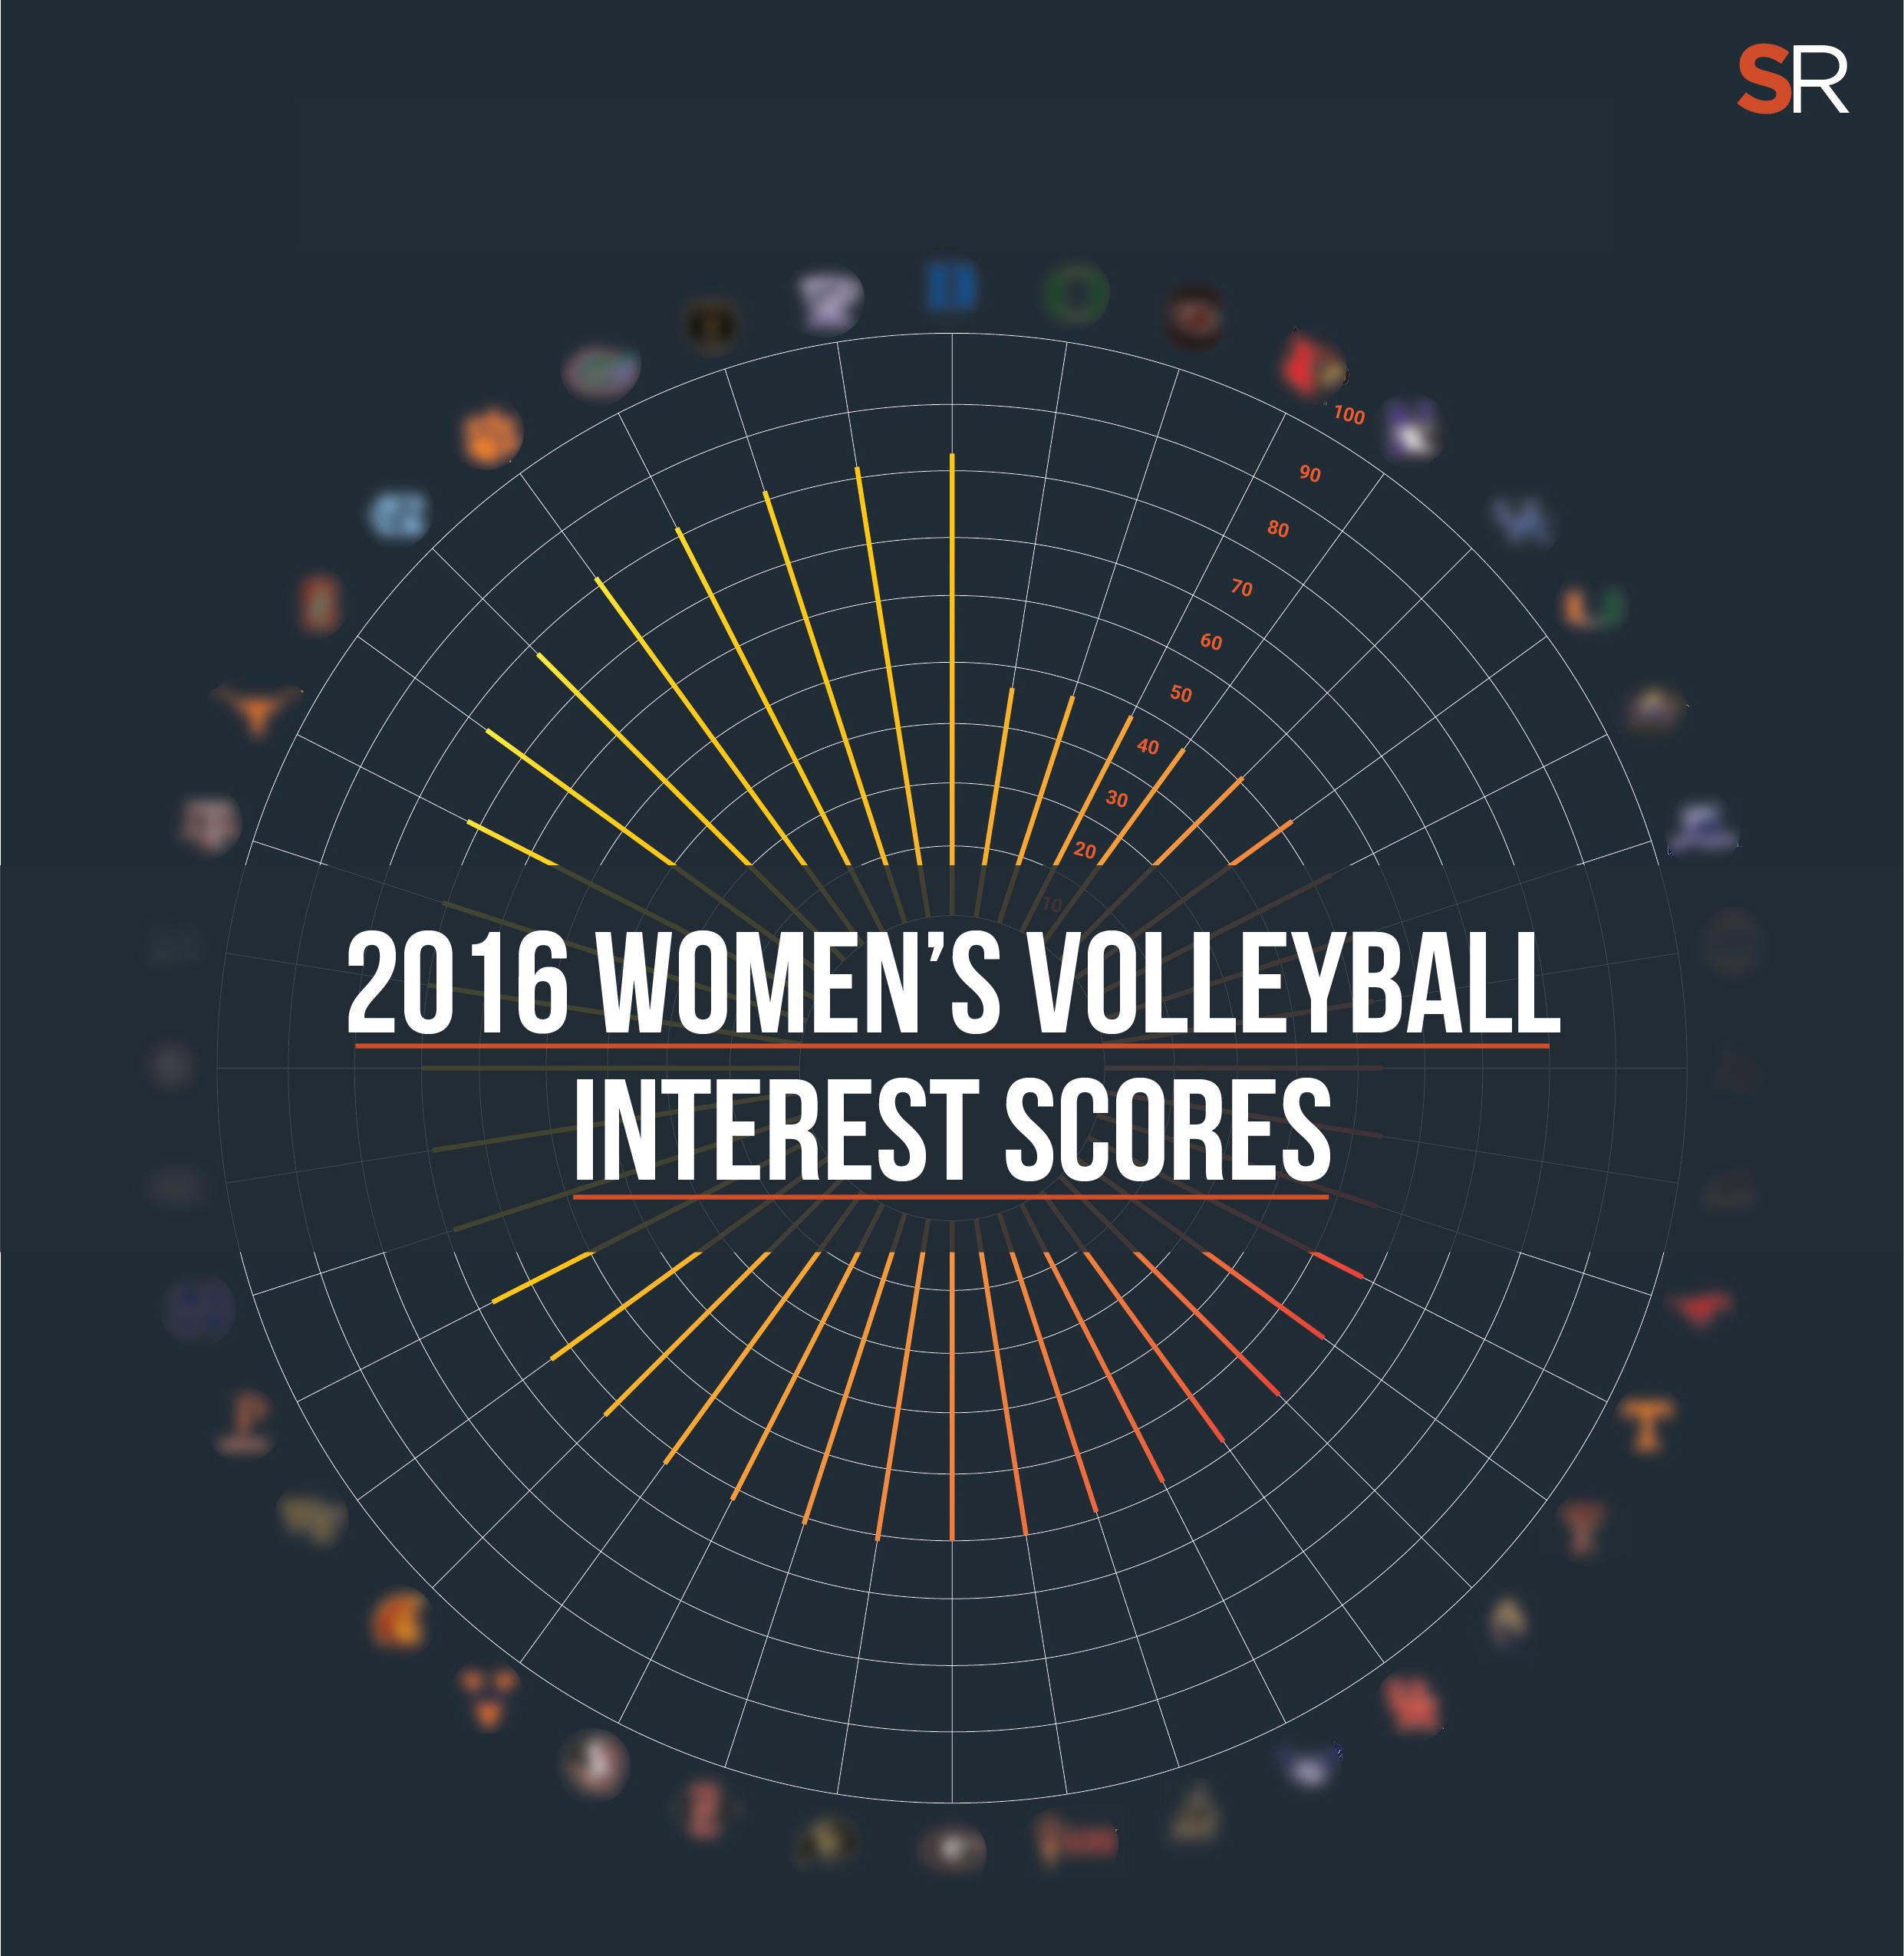 2016 Women's Volleyball Interest Scores